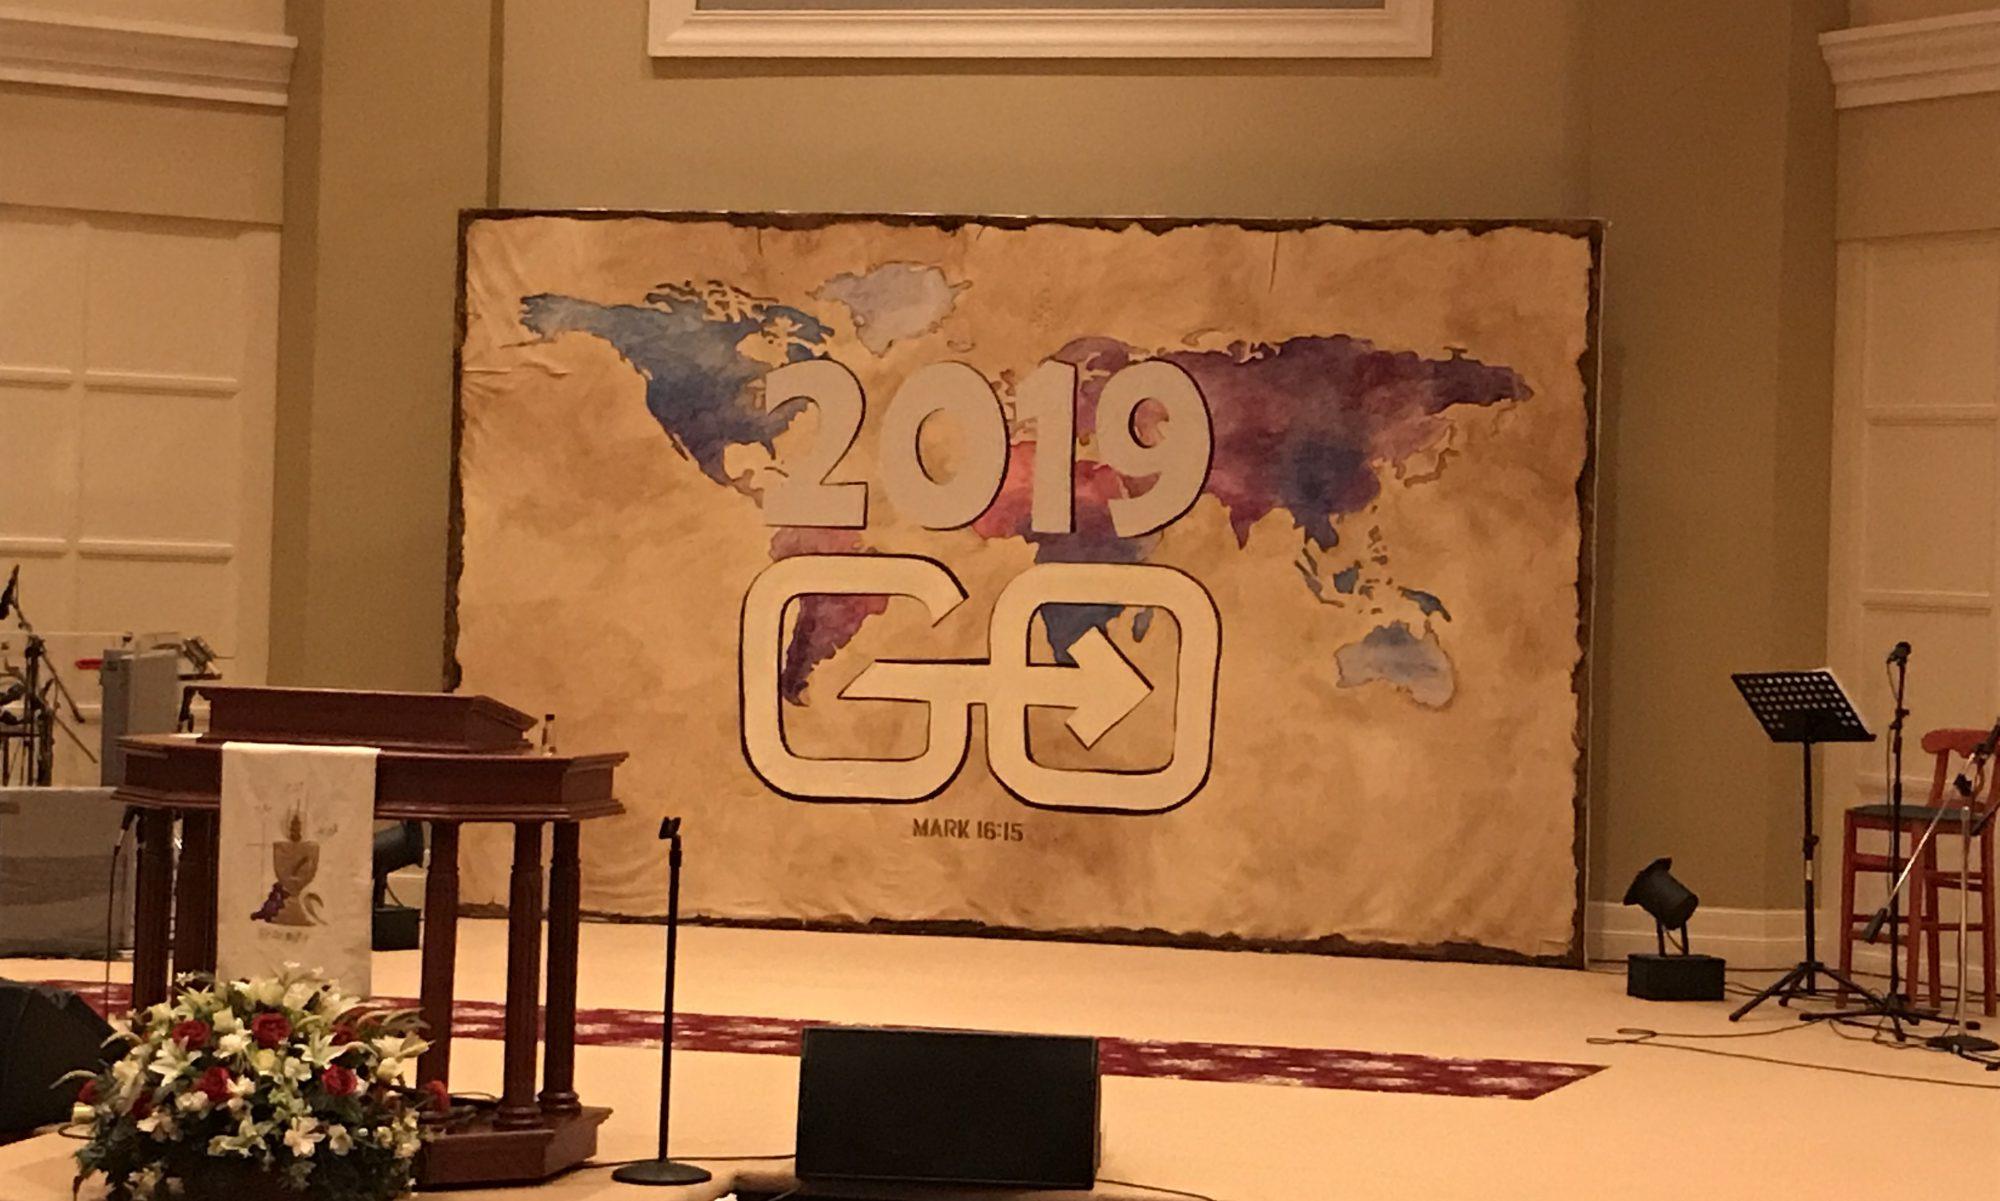 Northwest Tampa Church of God